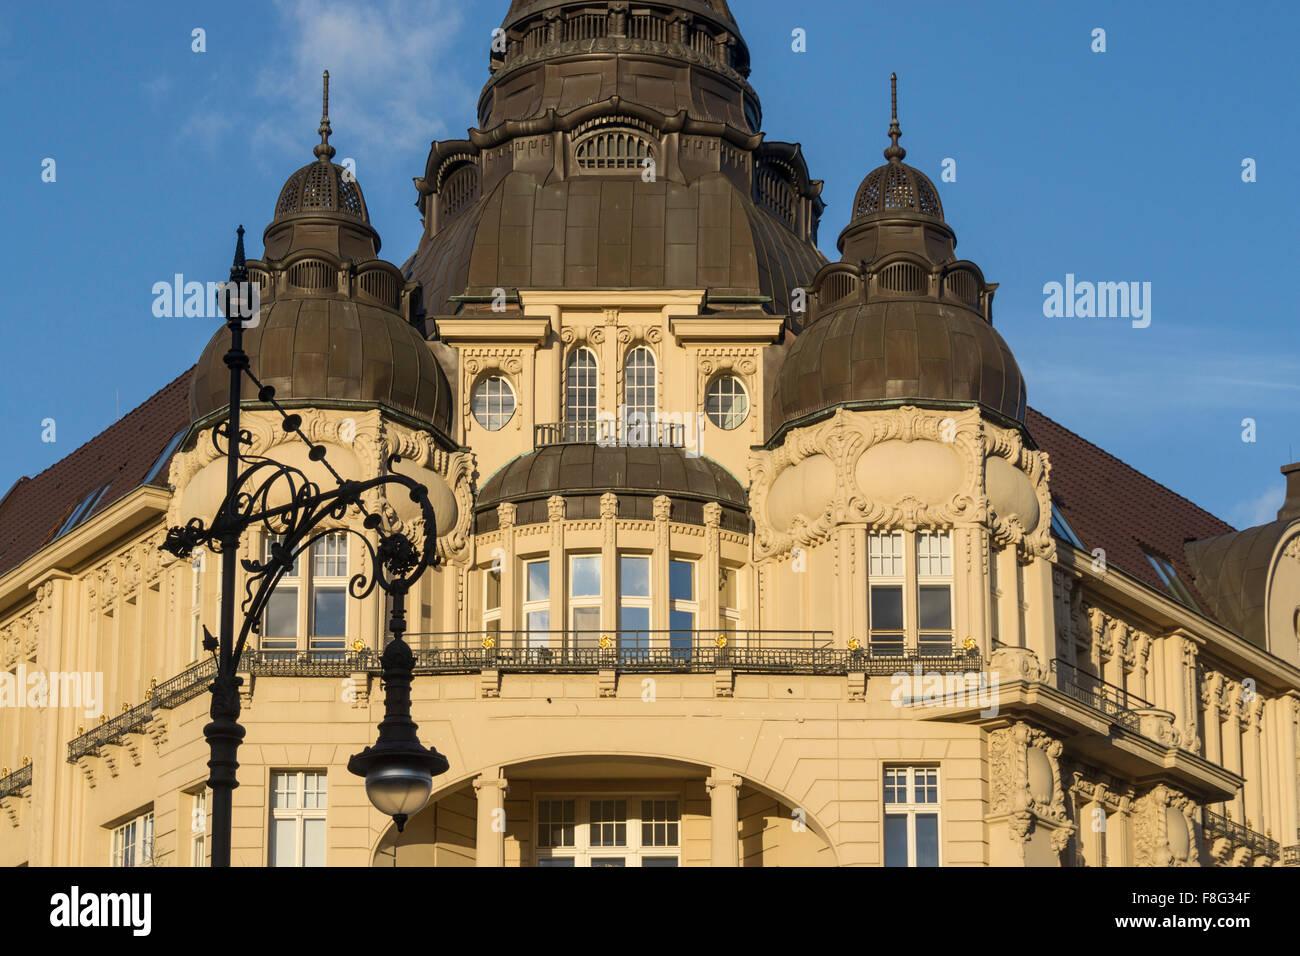 Kurfurstendamm, Luxery Building, City West, Berlin - Stock Image